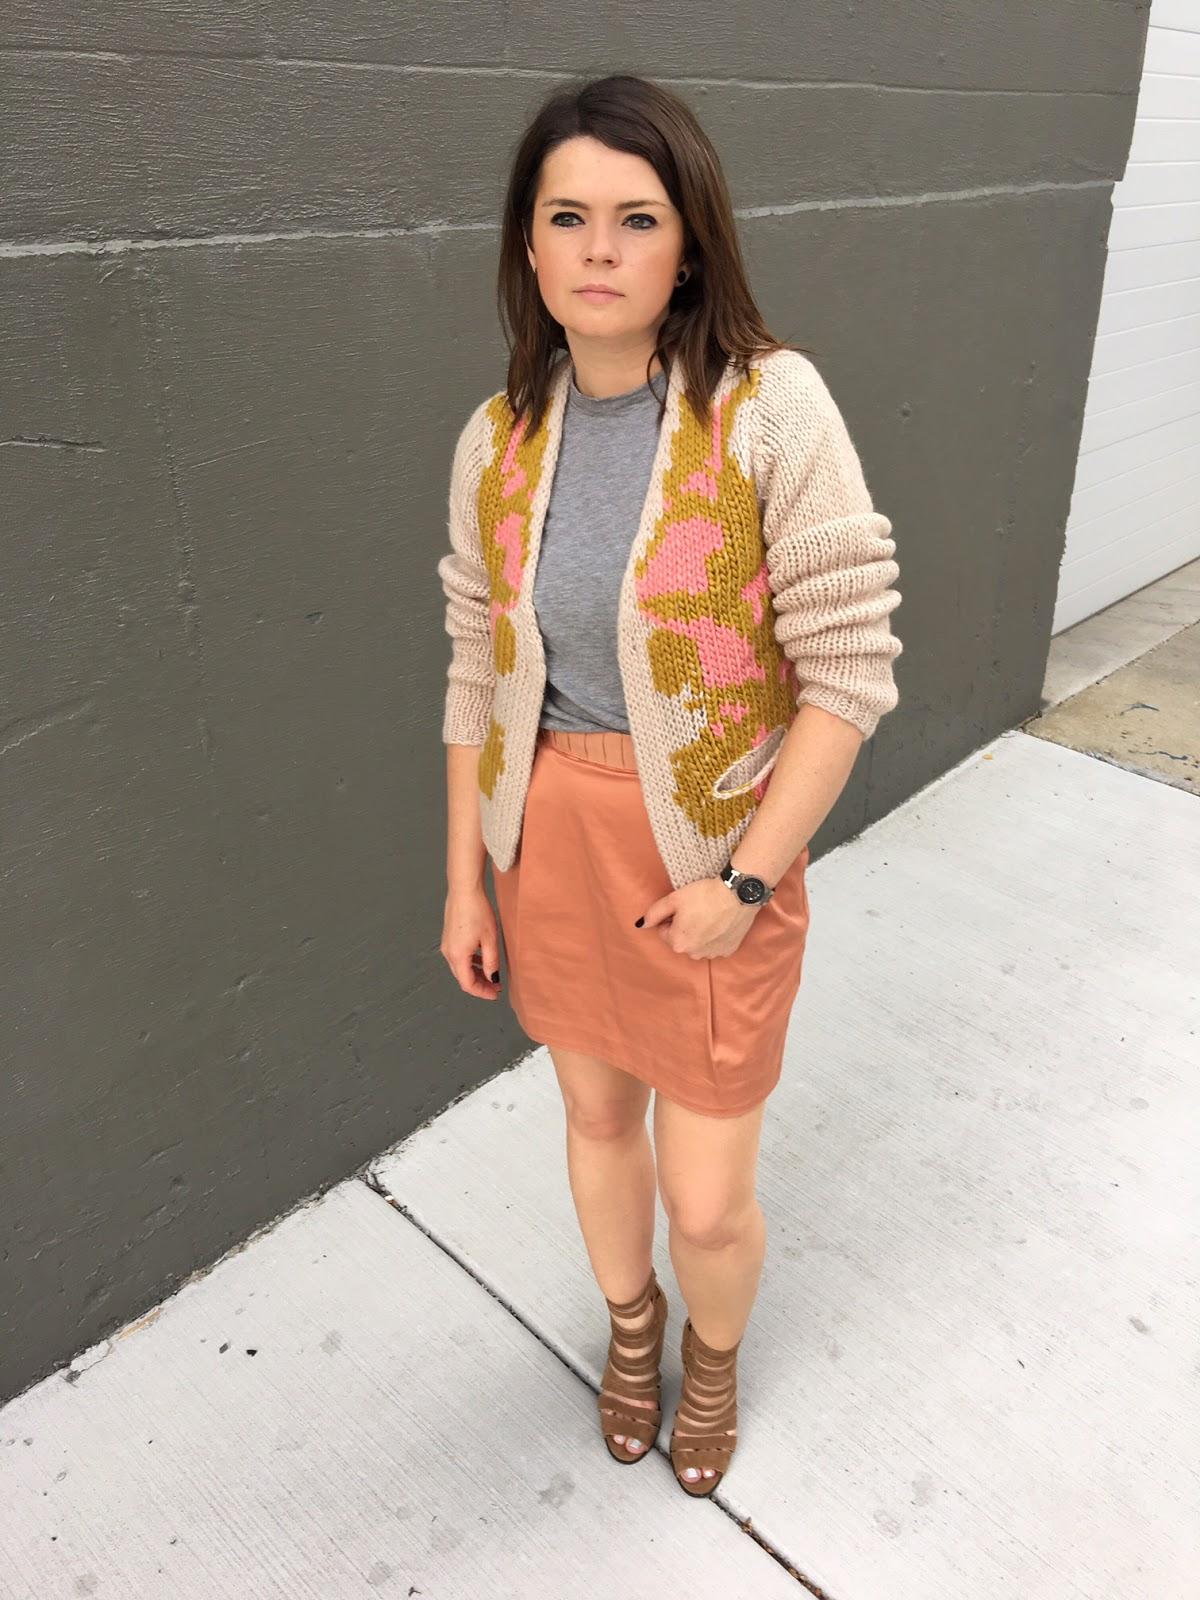 A mini skirt & a cardi